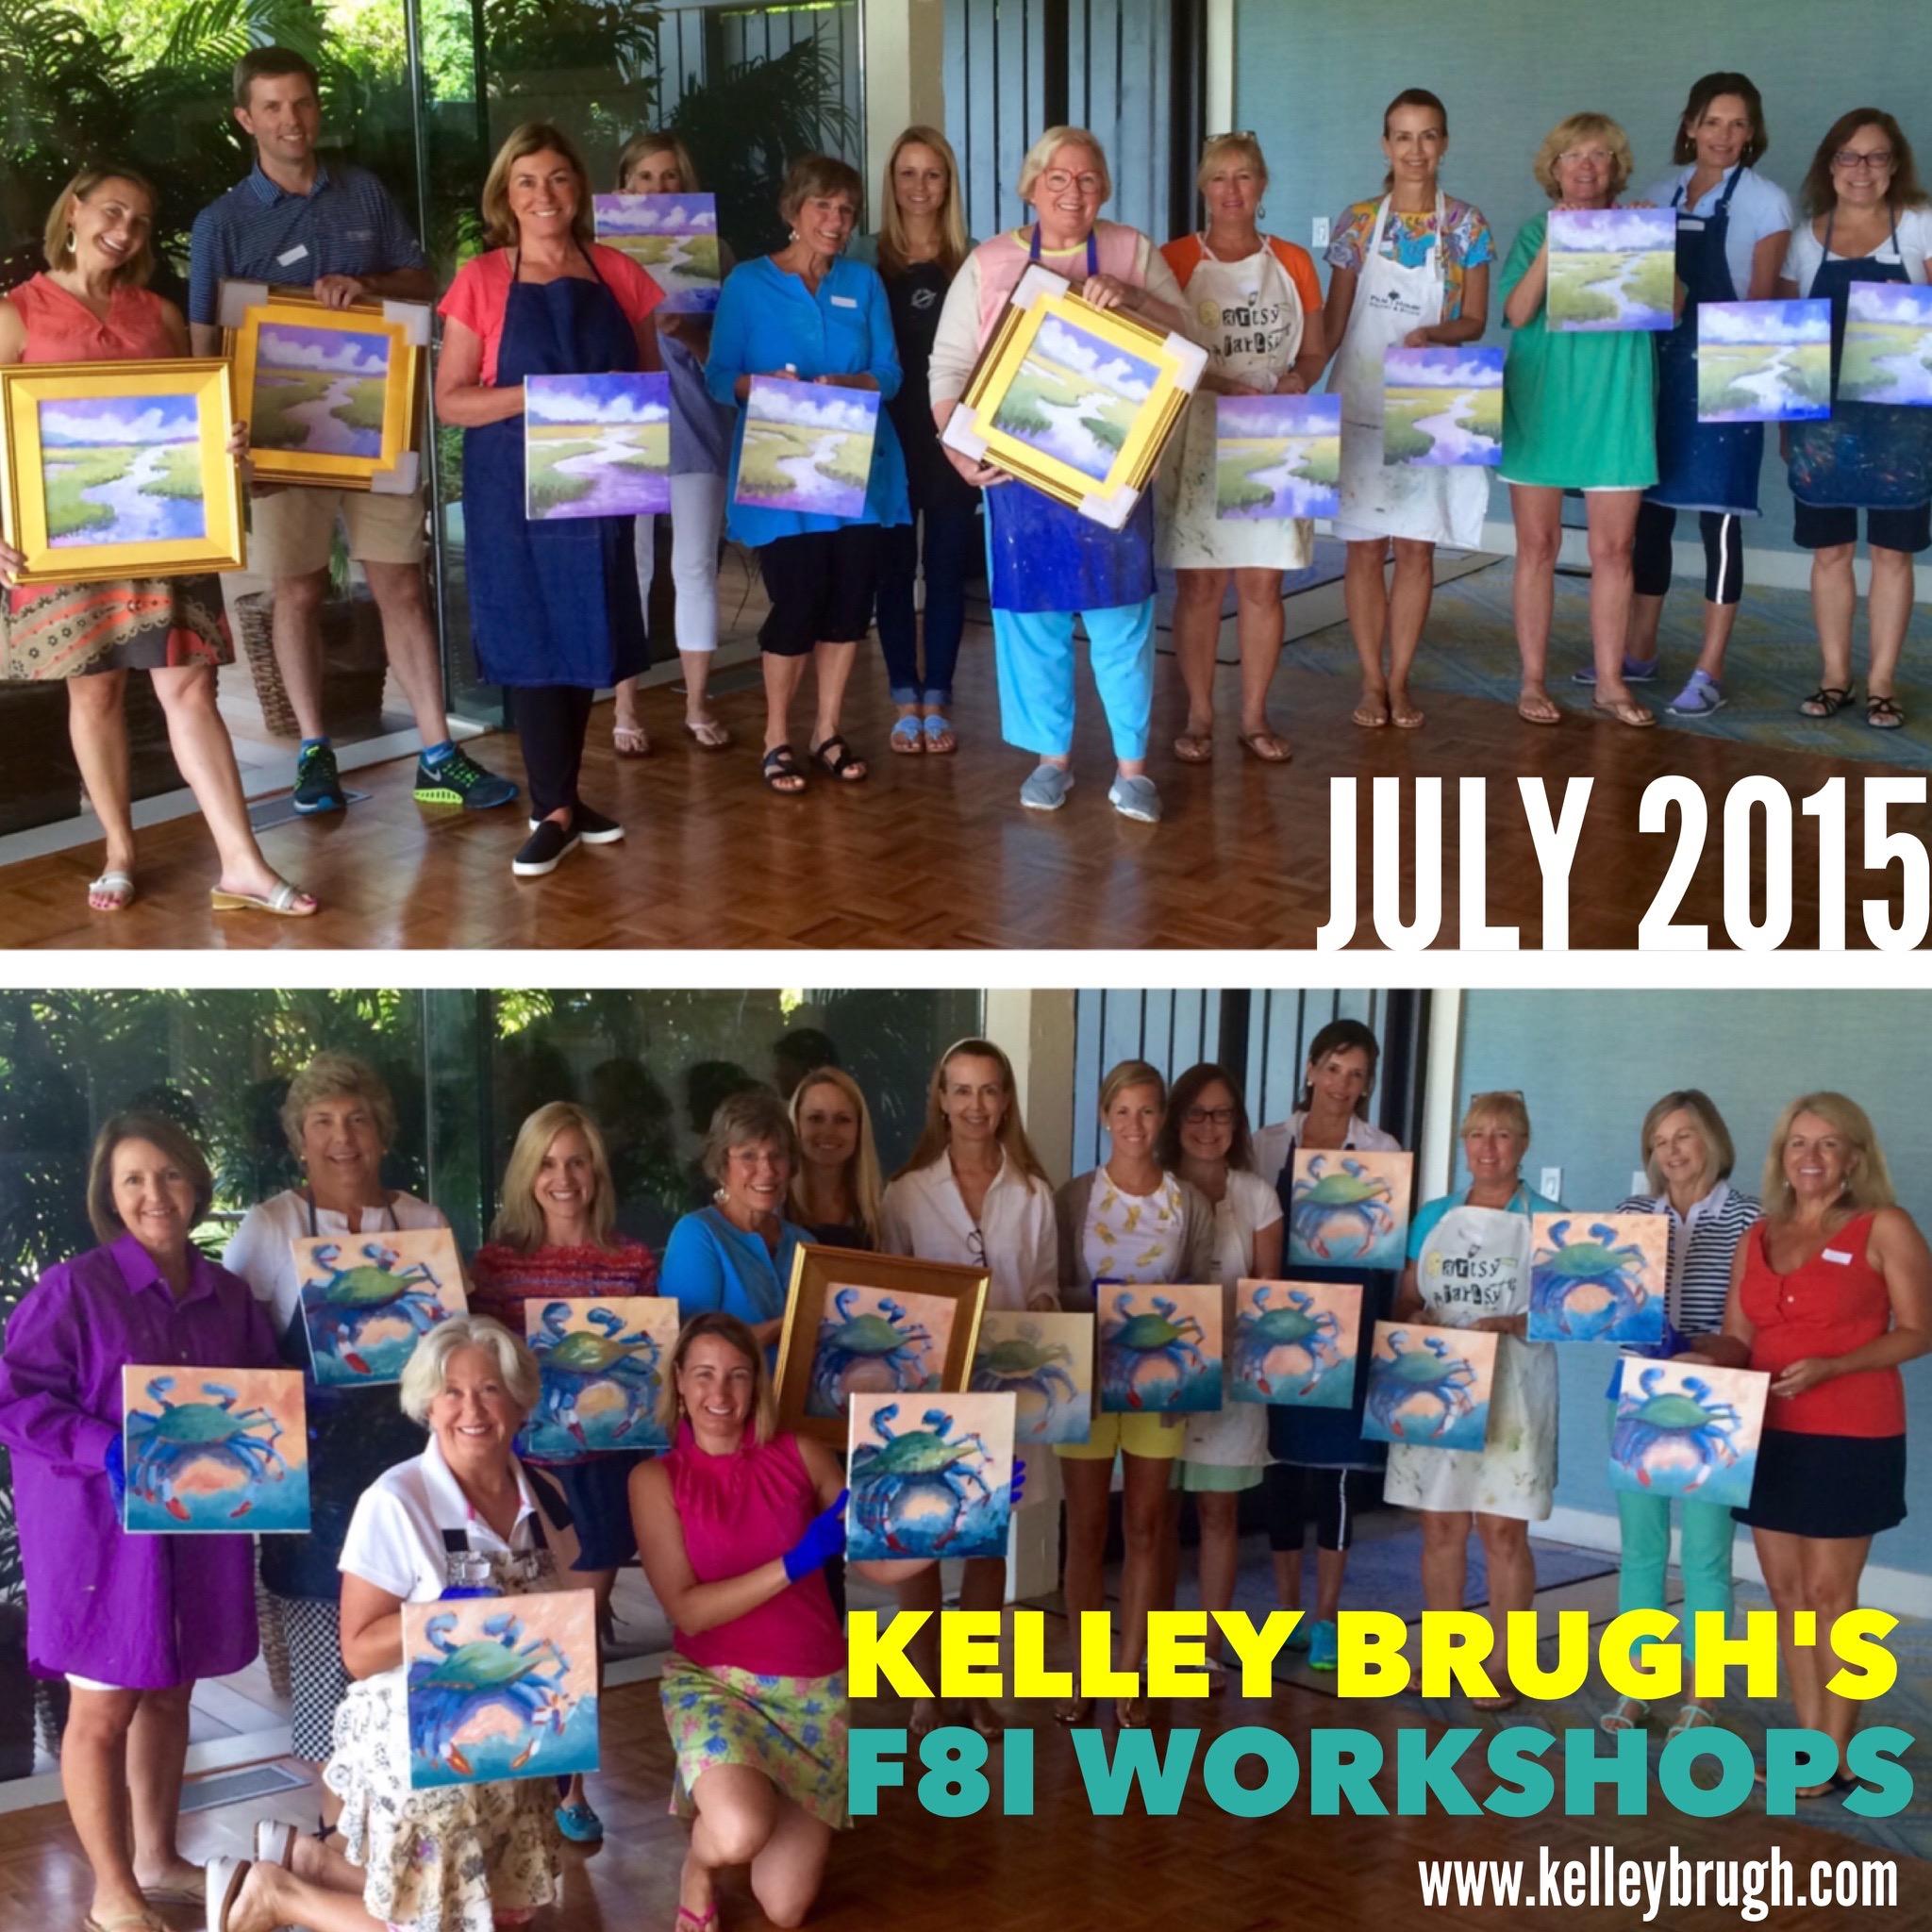 Kelley Brugh's F8I Workshops 2015.jpg